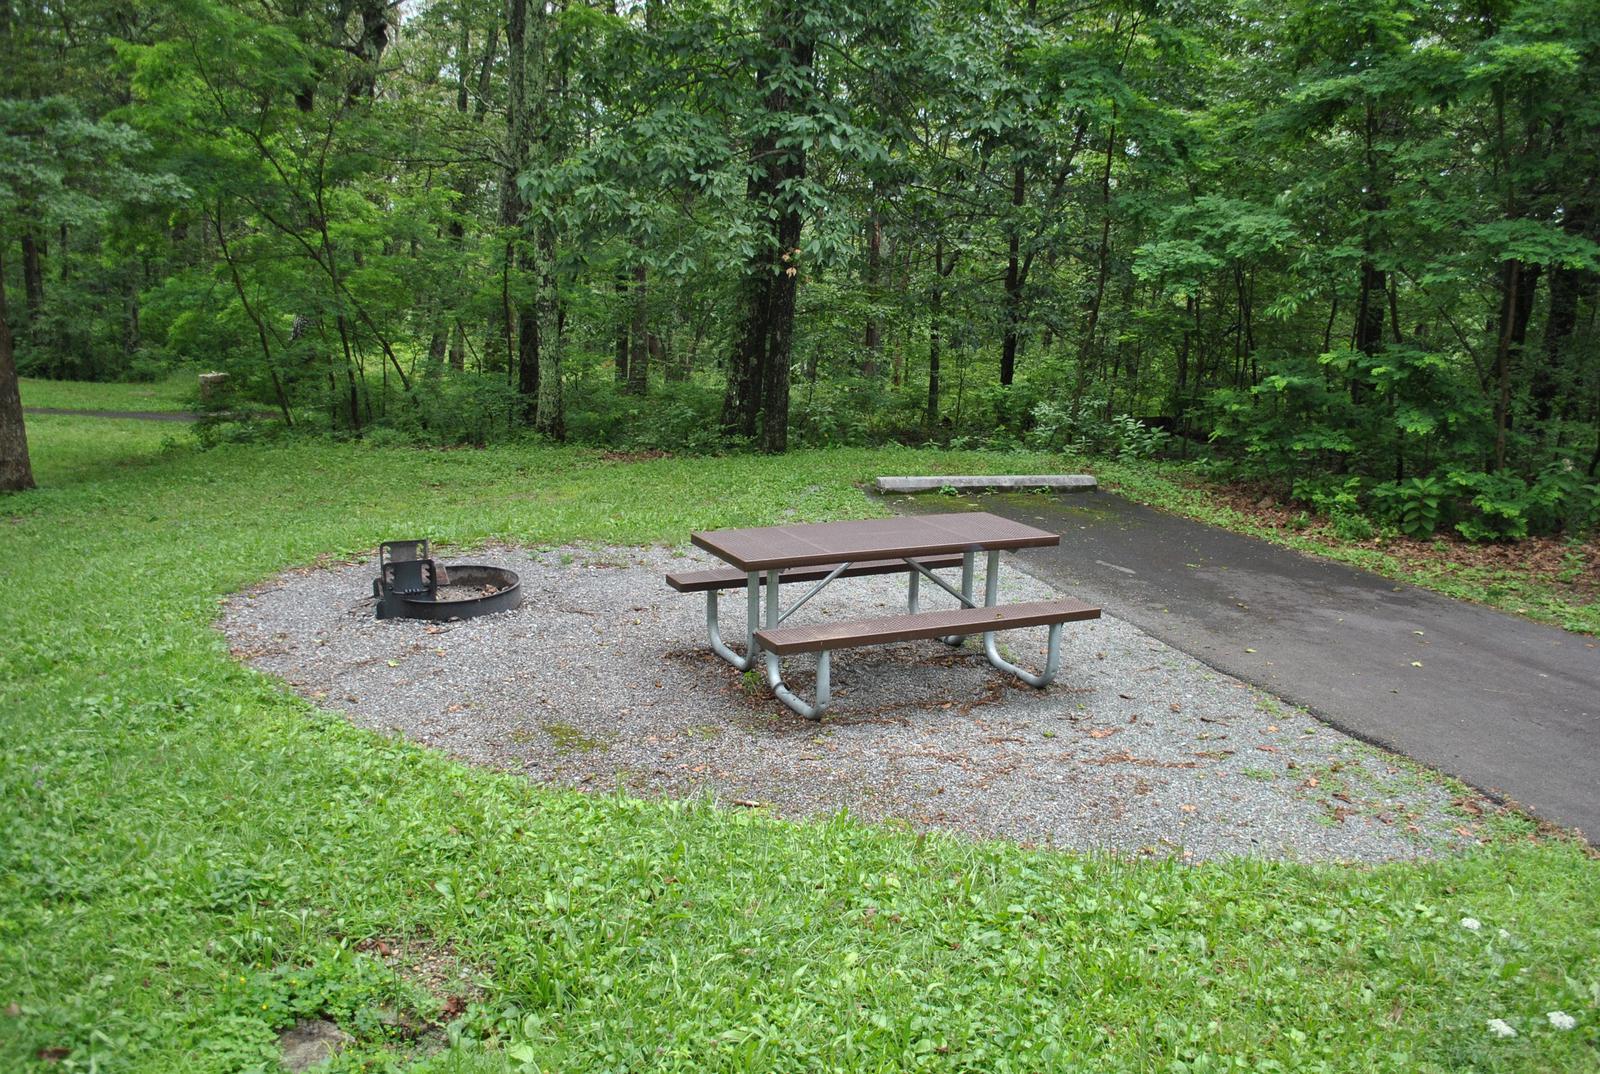 Mathews Arm Campground – Site A044